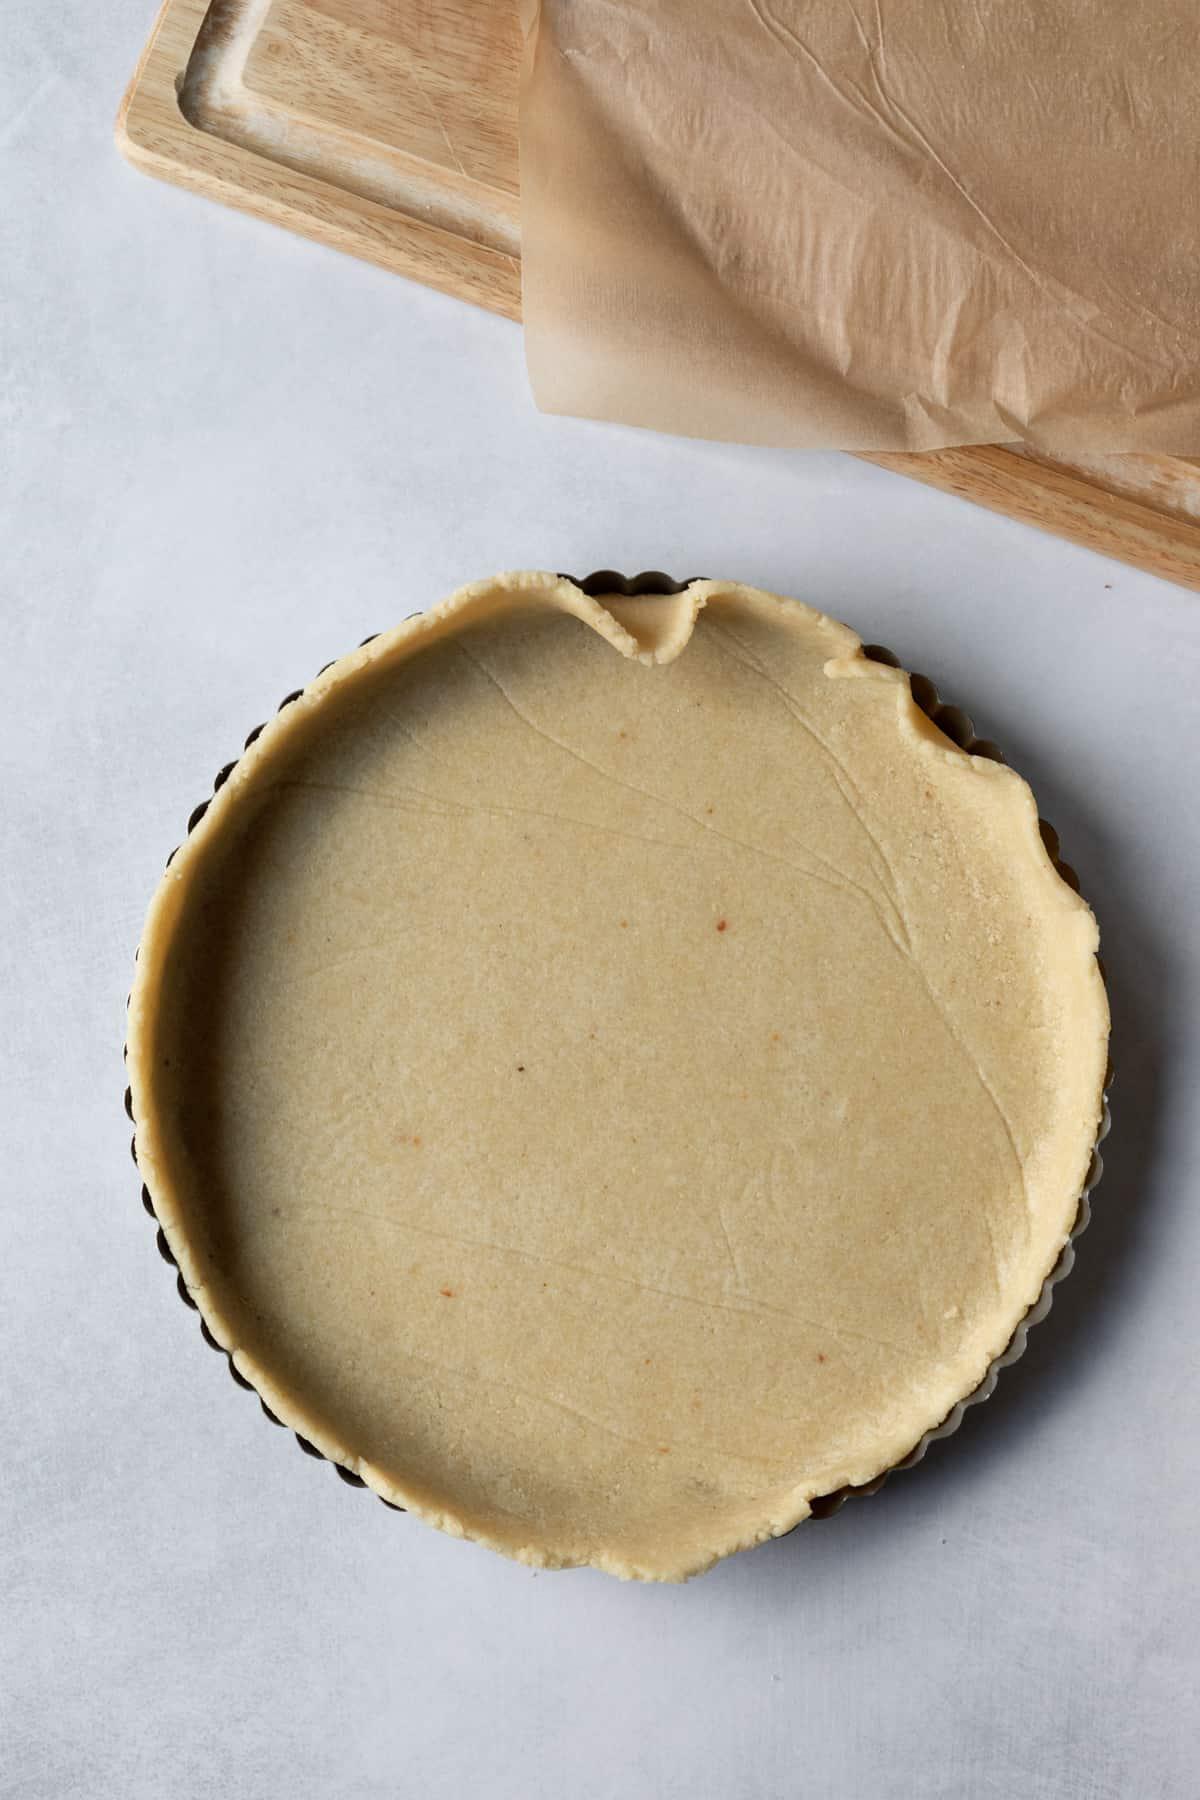 dough flipped into pan ready to trim edges